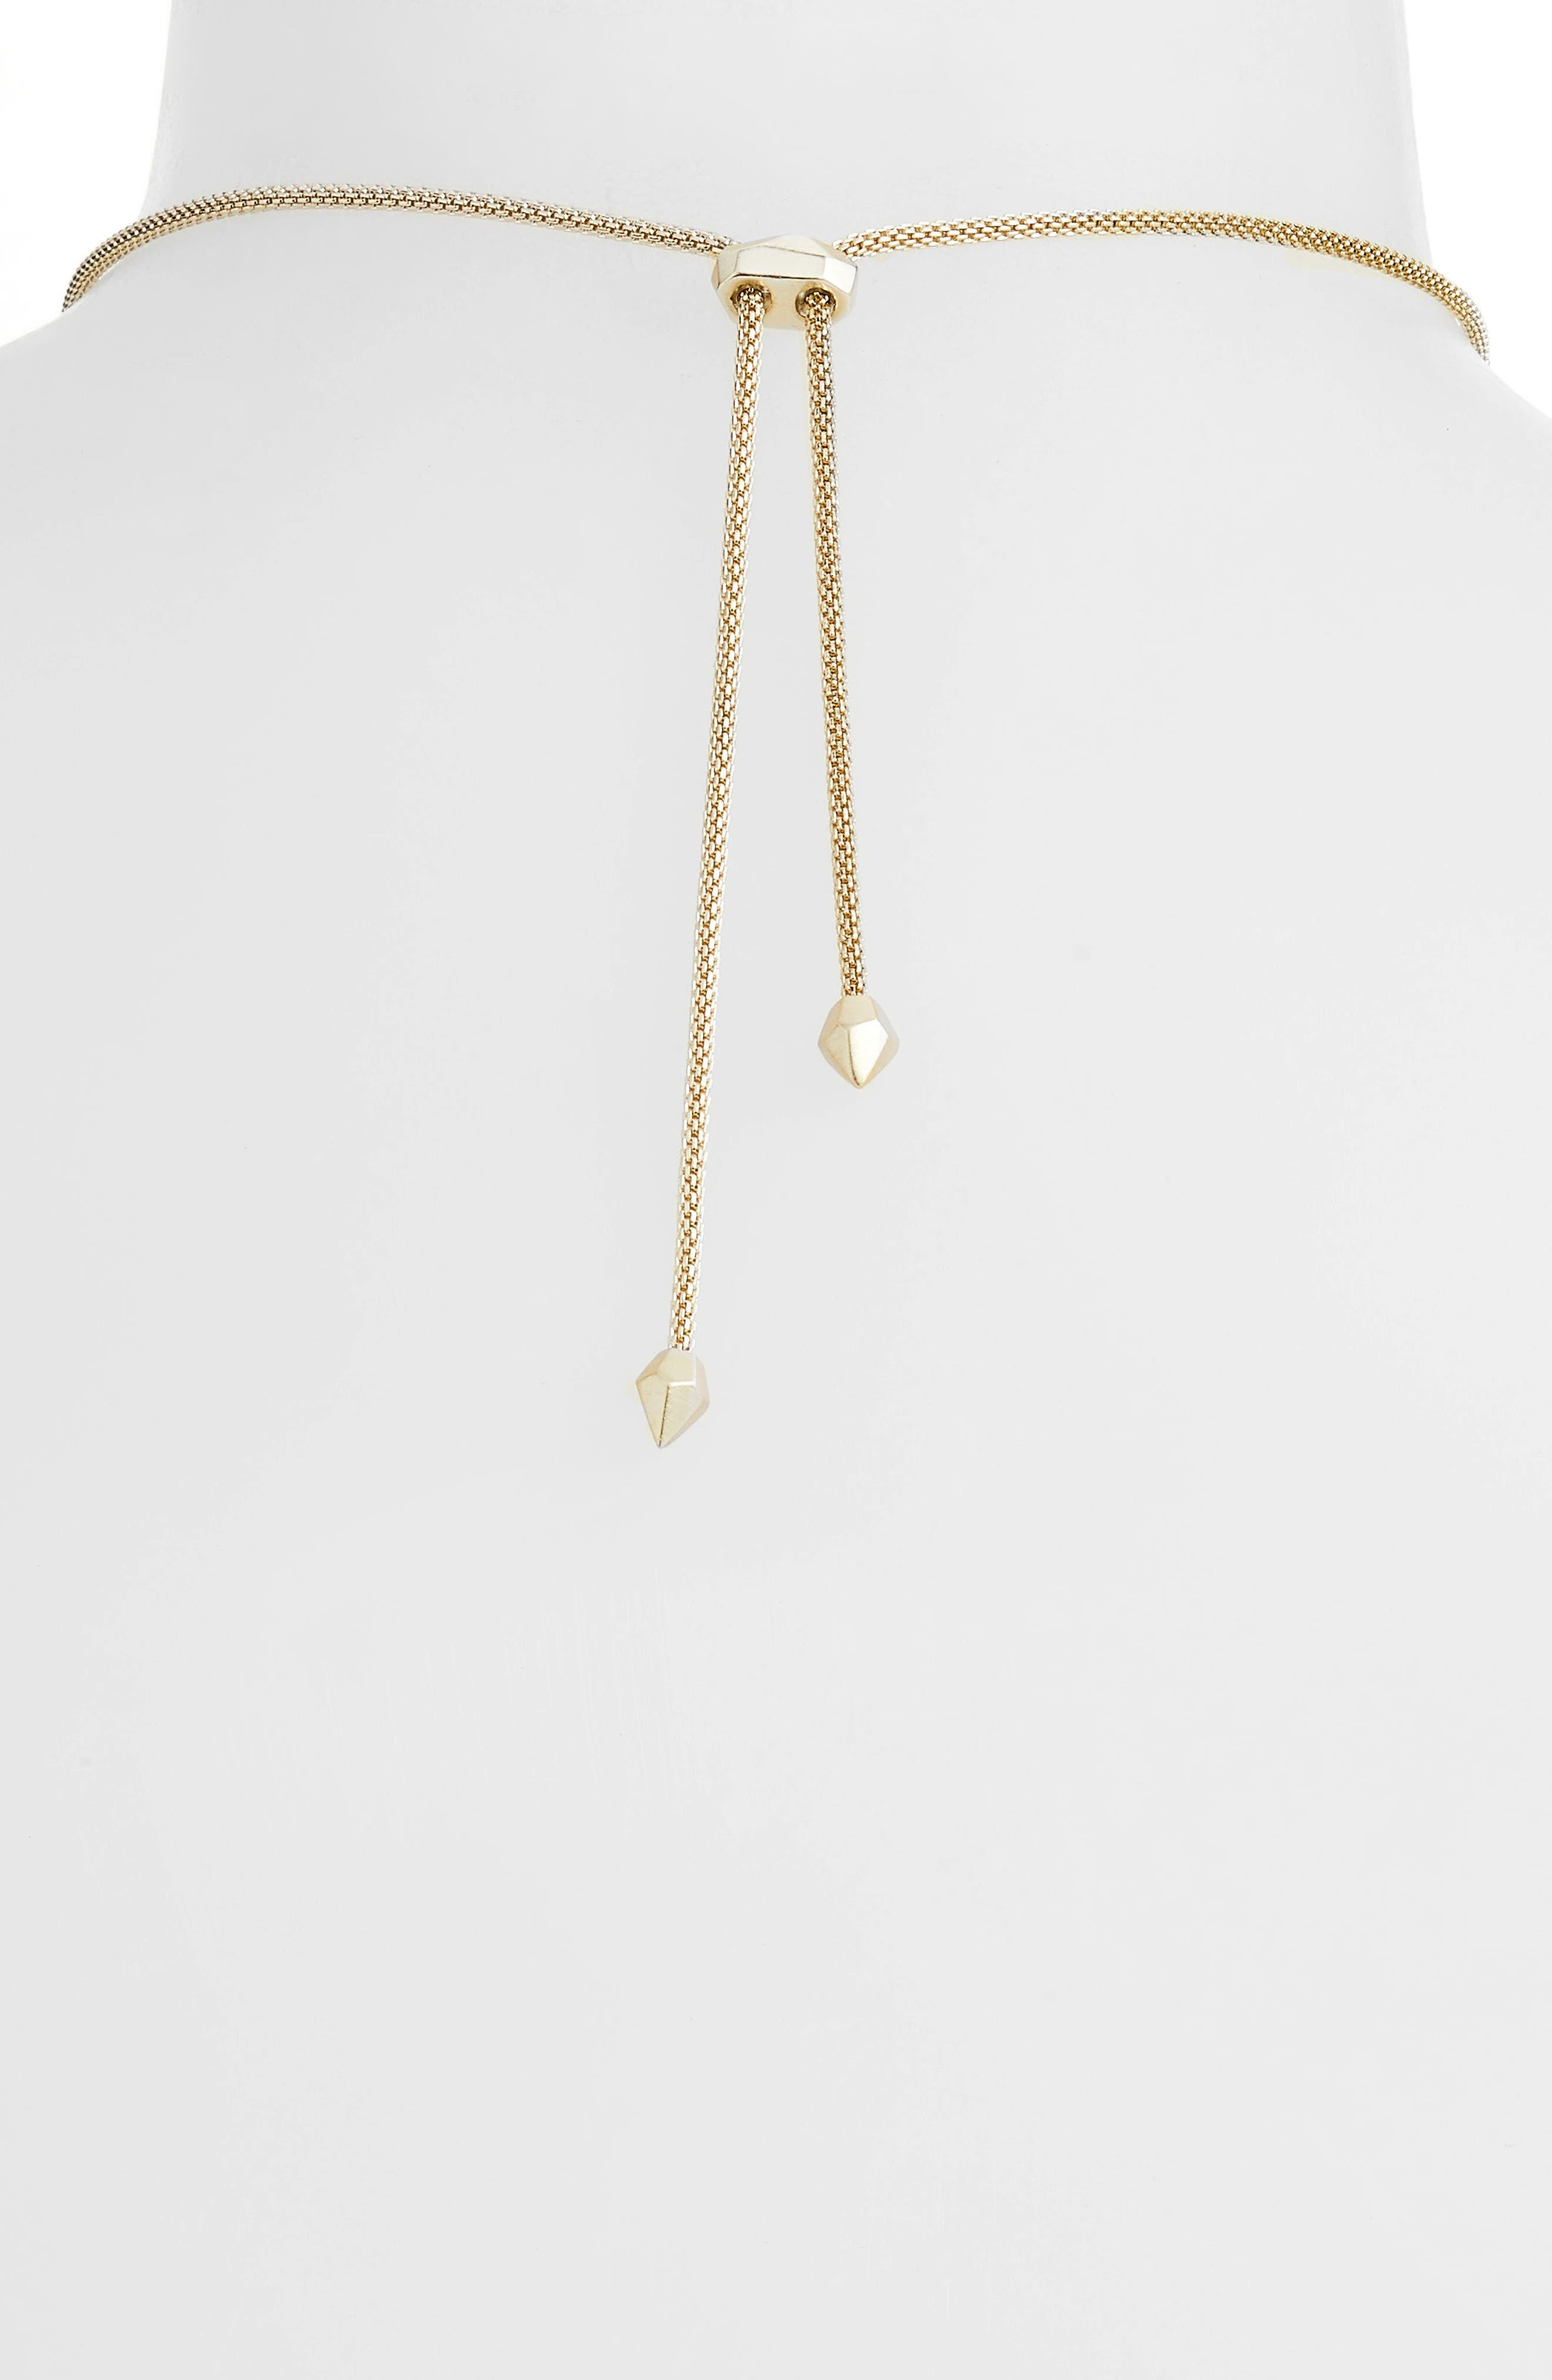 KENDRA SCOTT, Inez Pendant Necklace, Alternate thumbnail 4, color, BLACK/ GOLD